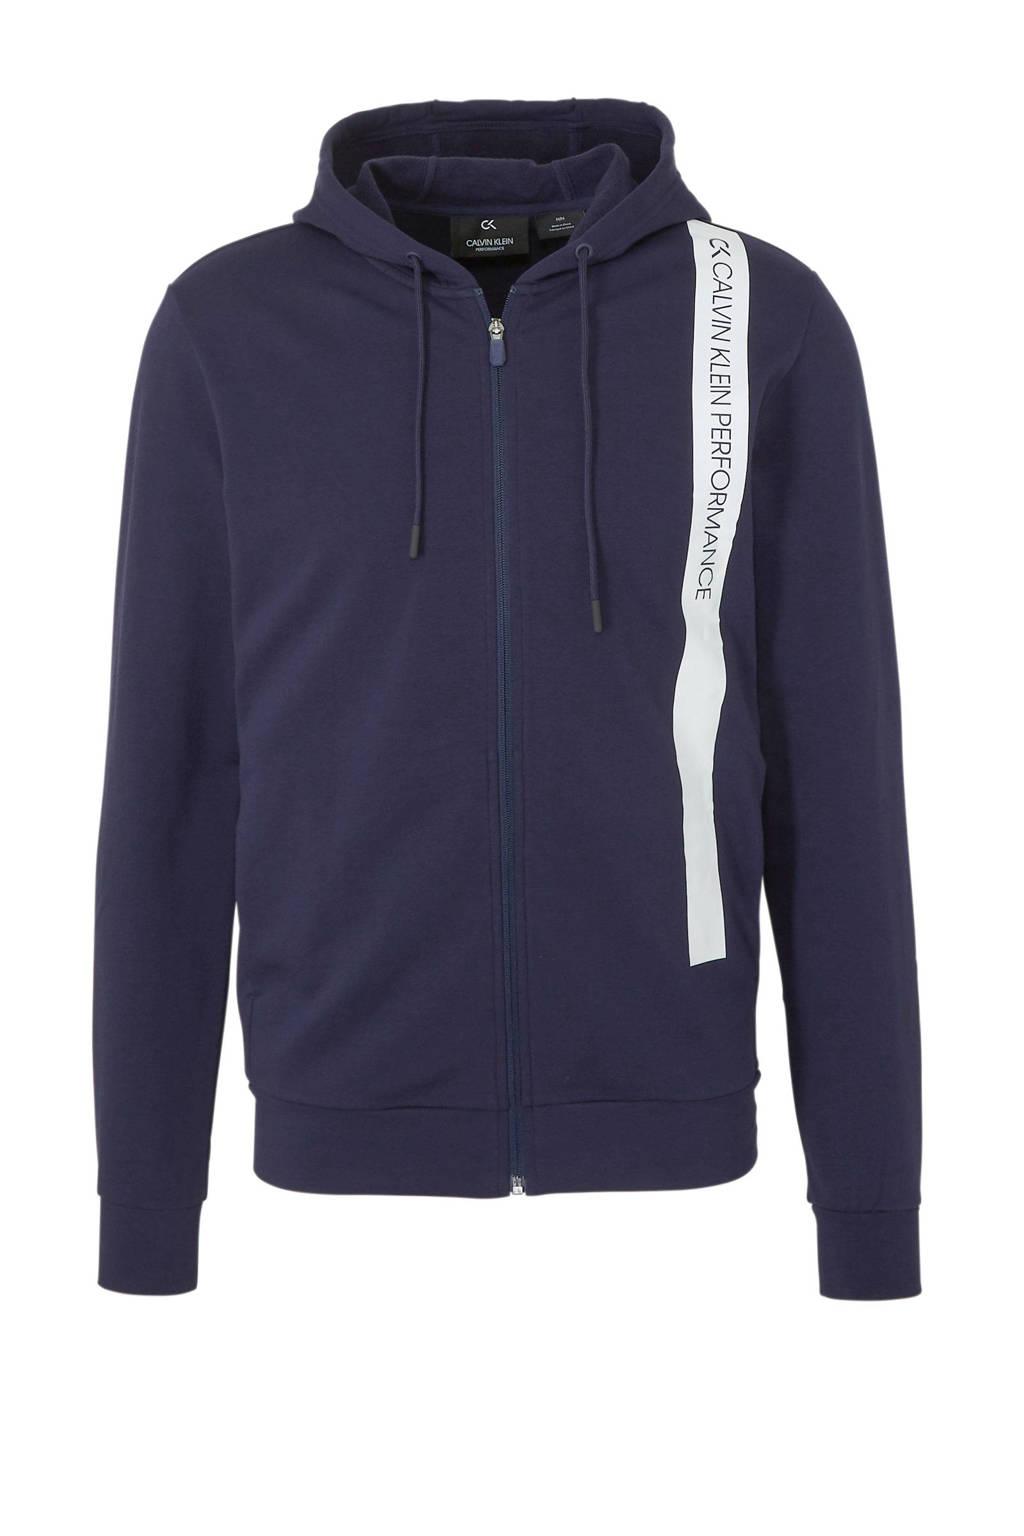 CALVIN KLEIN PERFORMANCE   vest met printopdruk donkerblauw/wit, Donkerblauw/wit